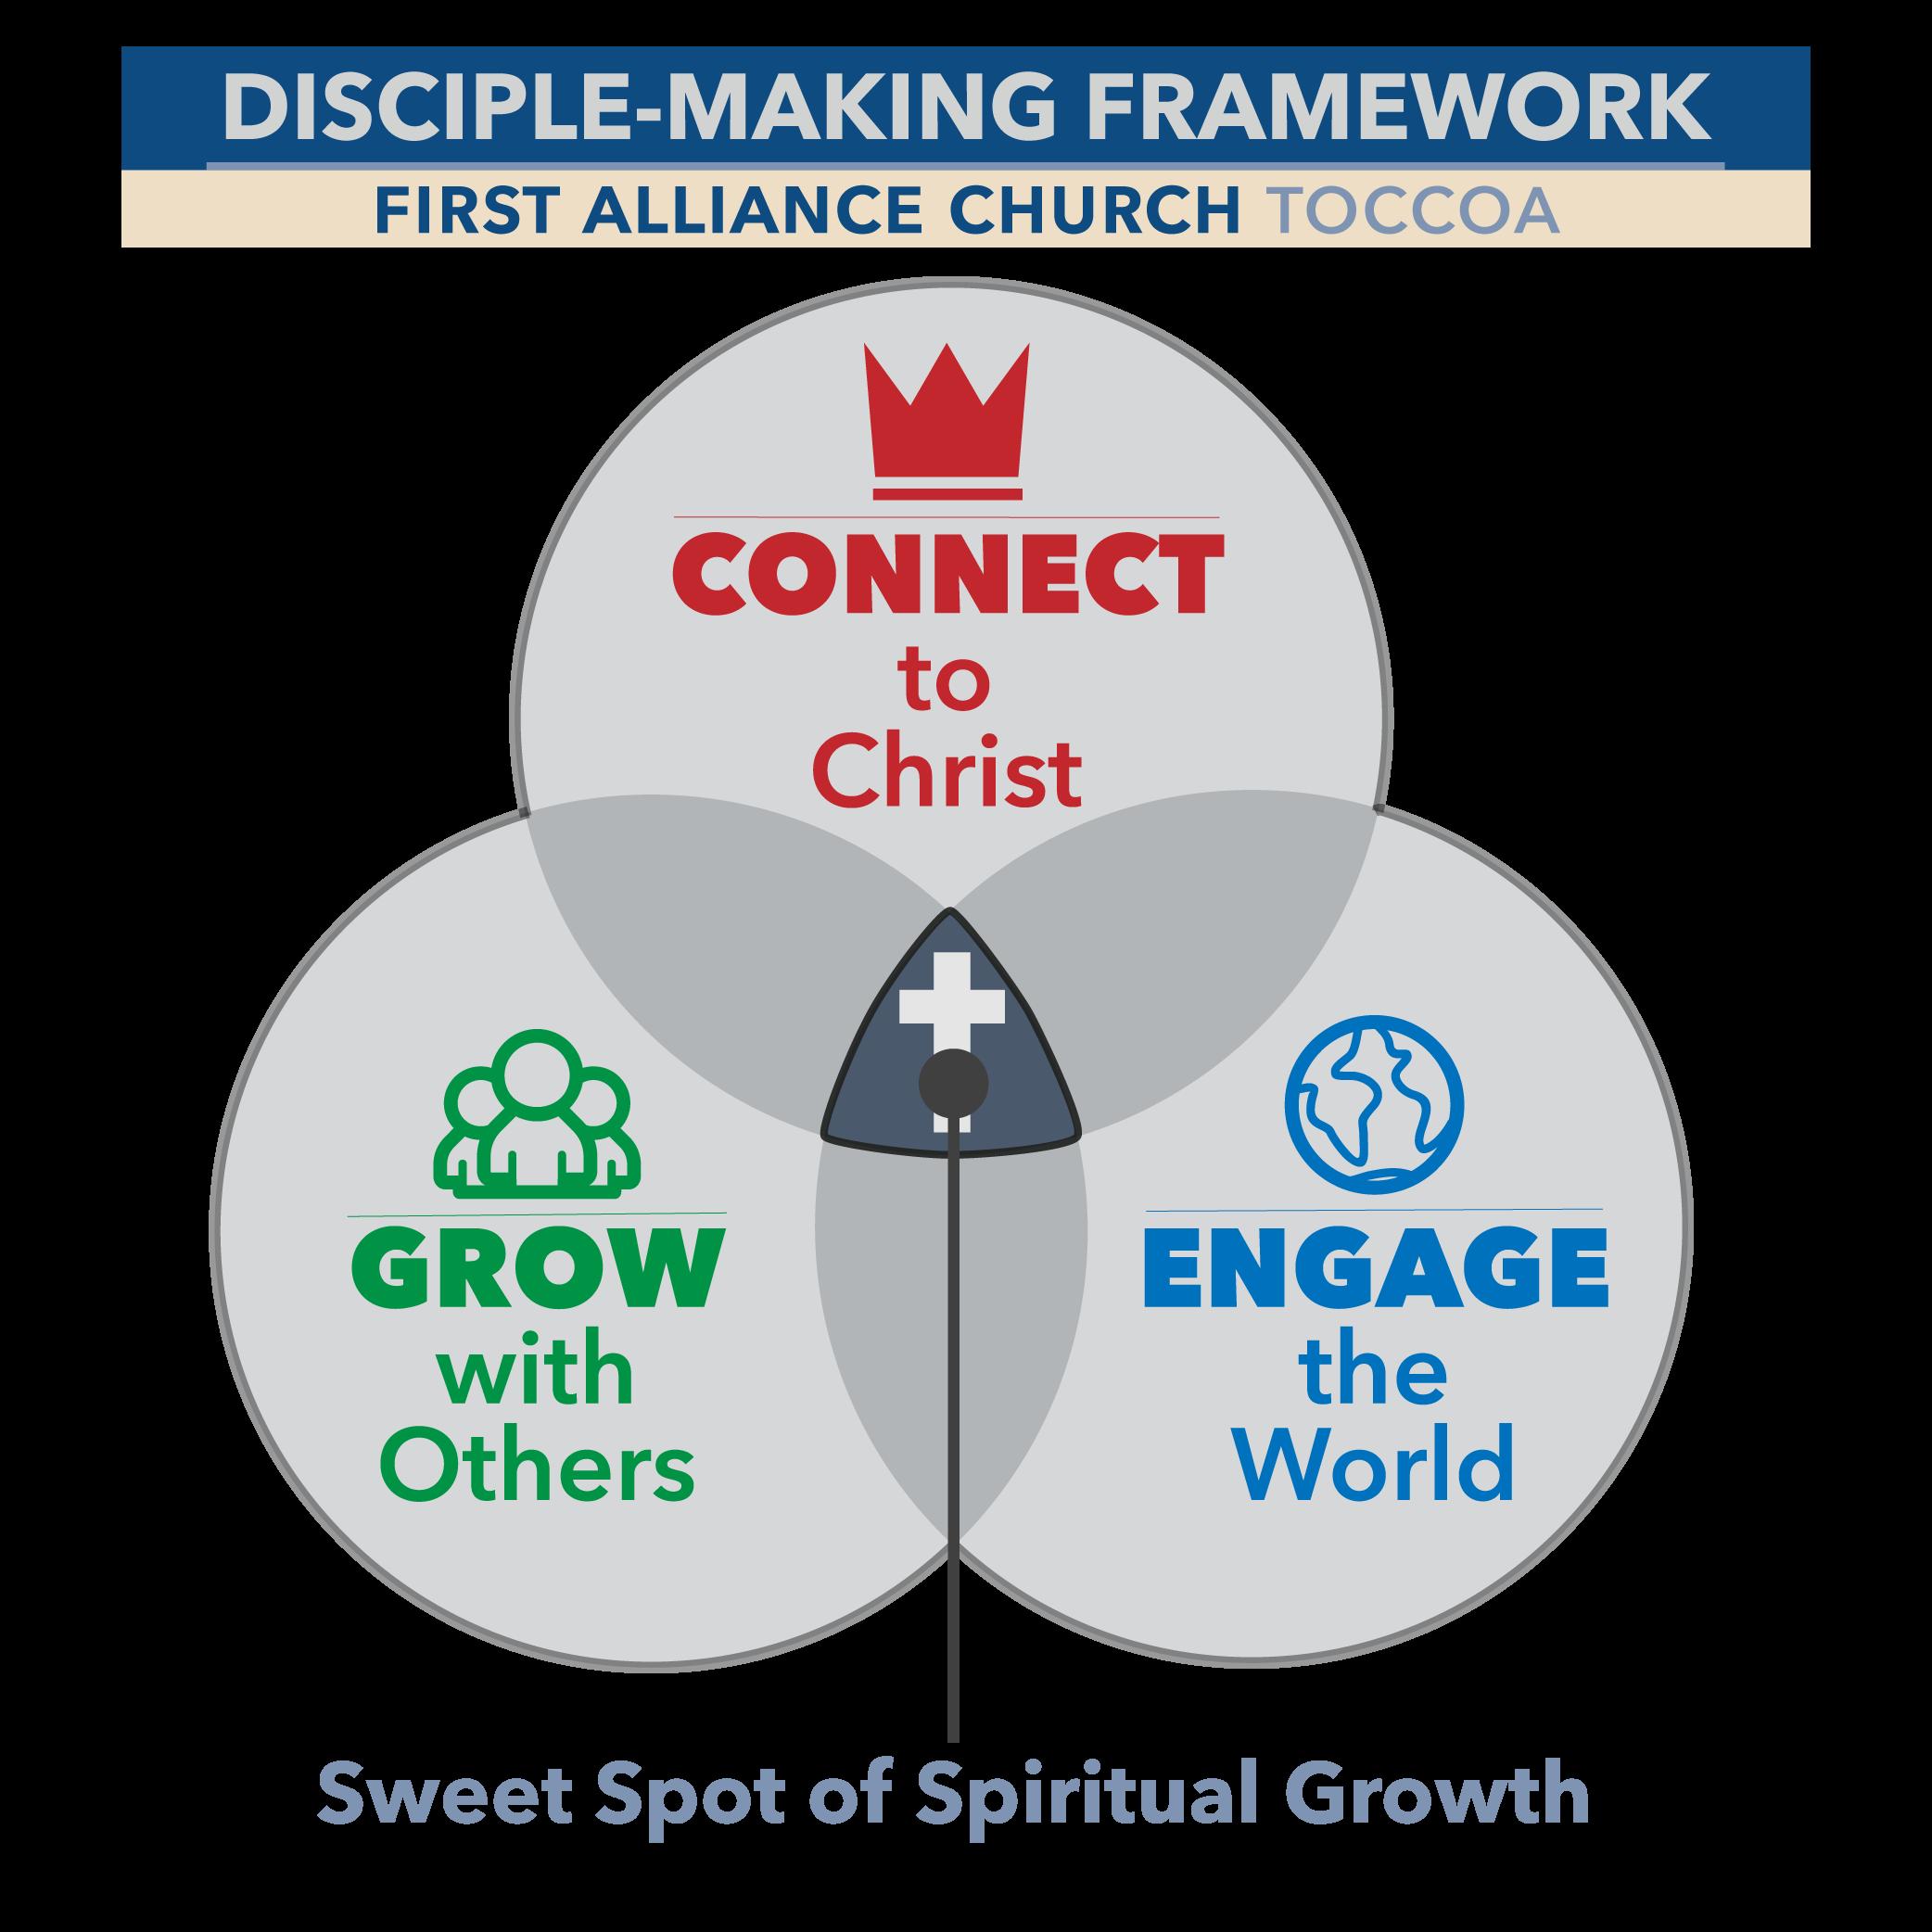 discipleship framework-01.png